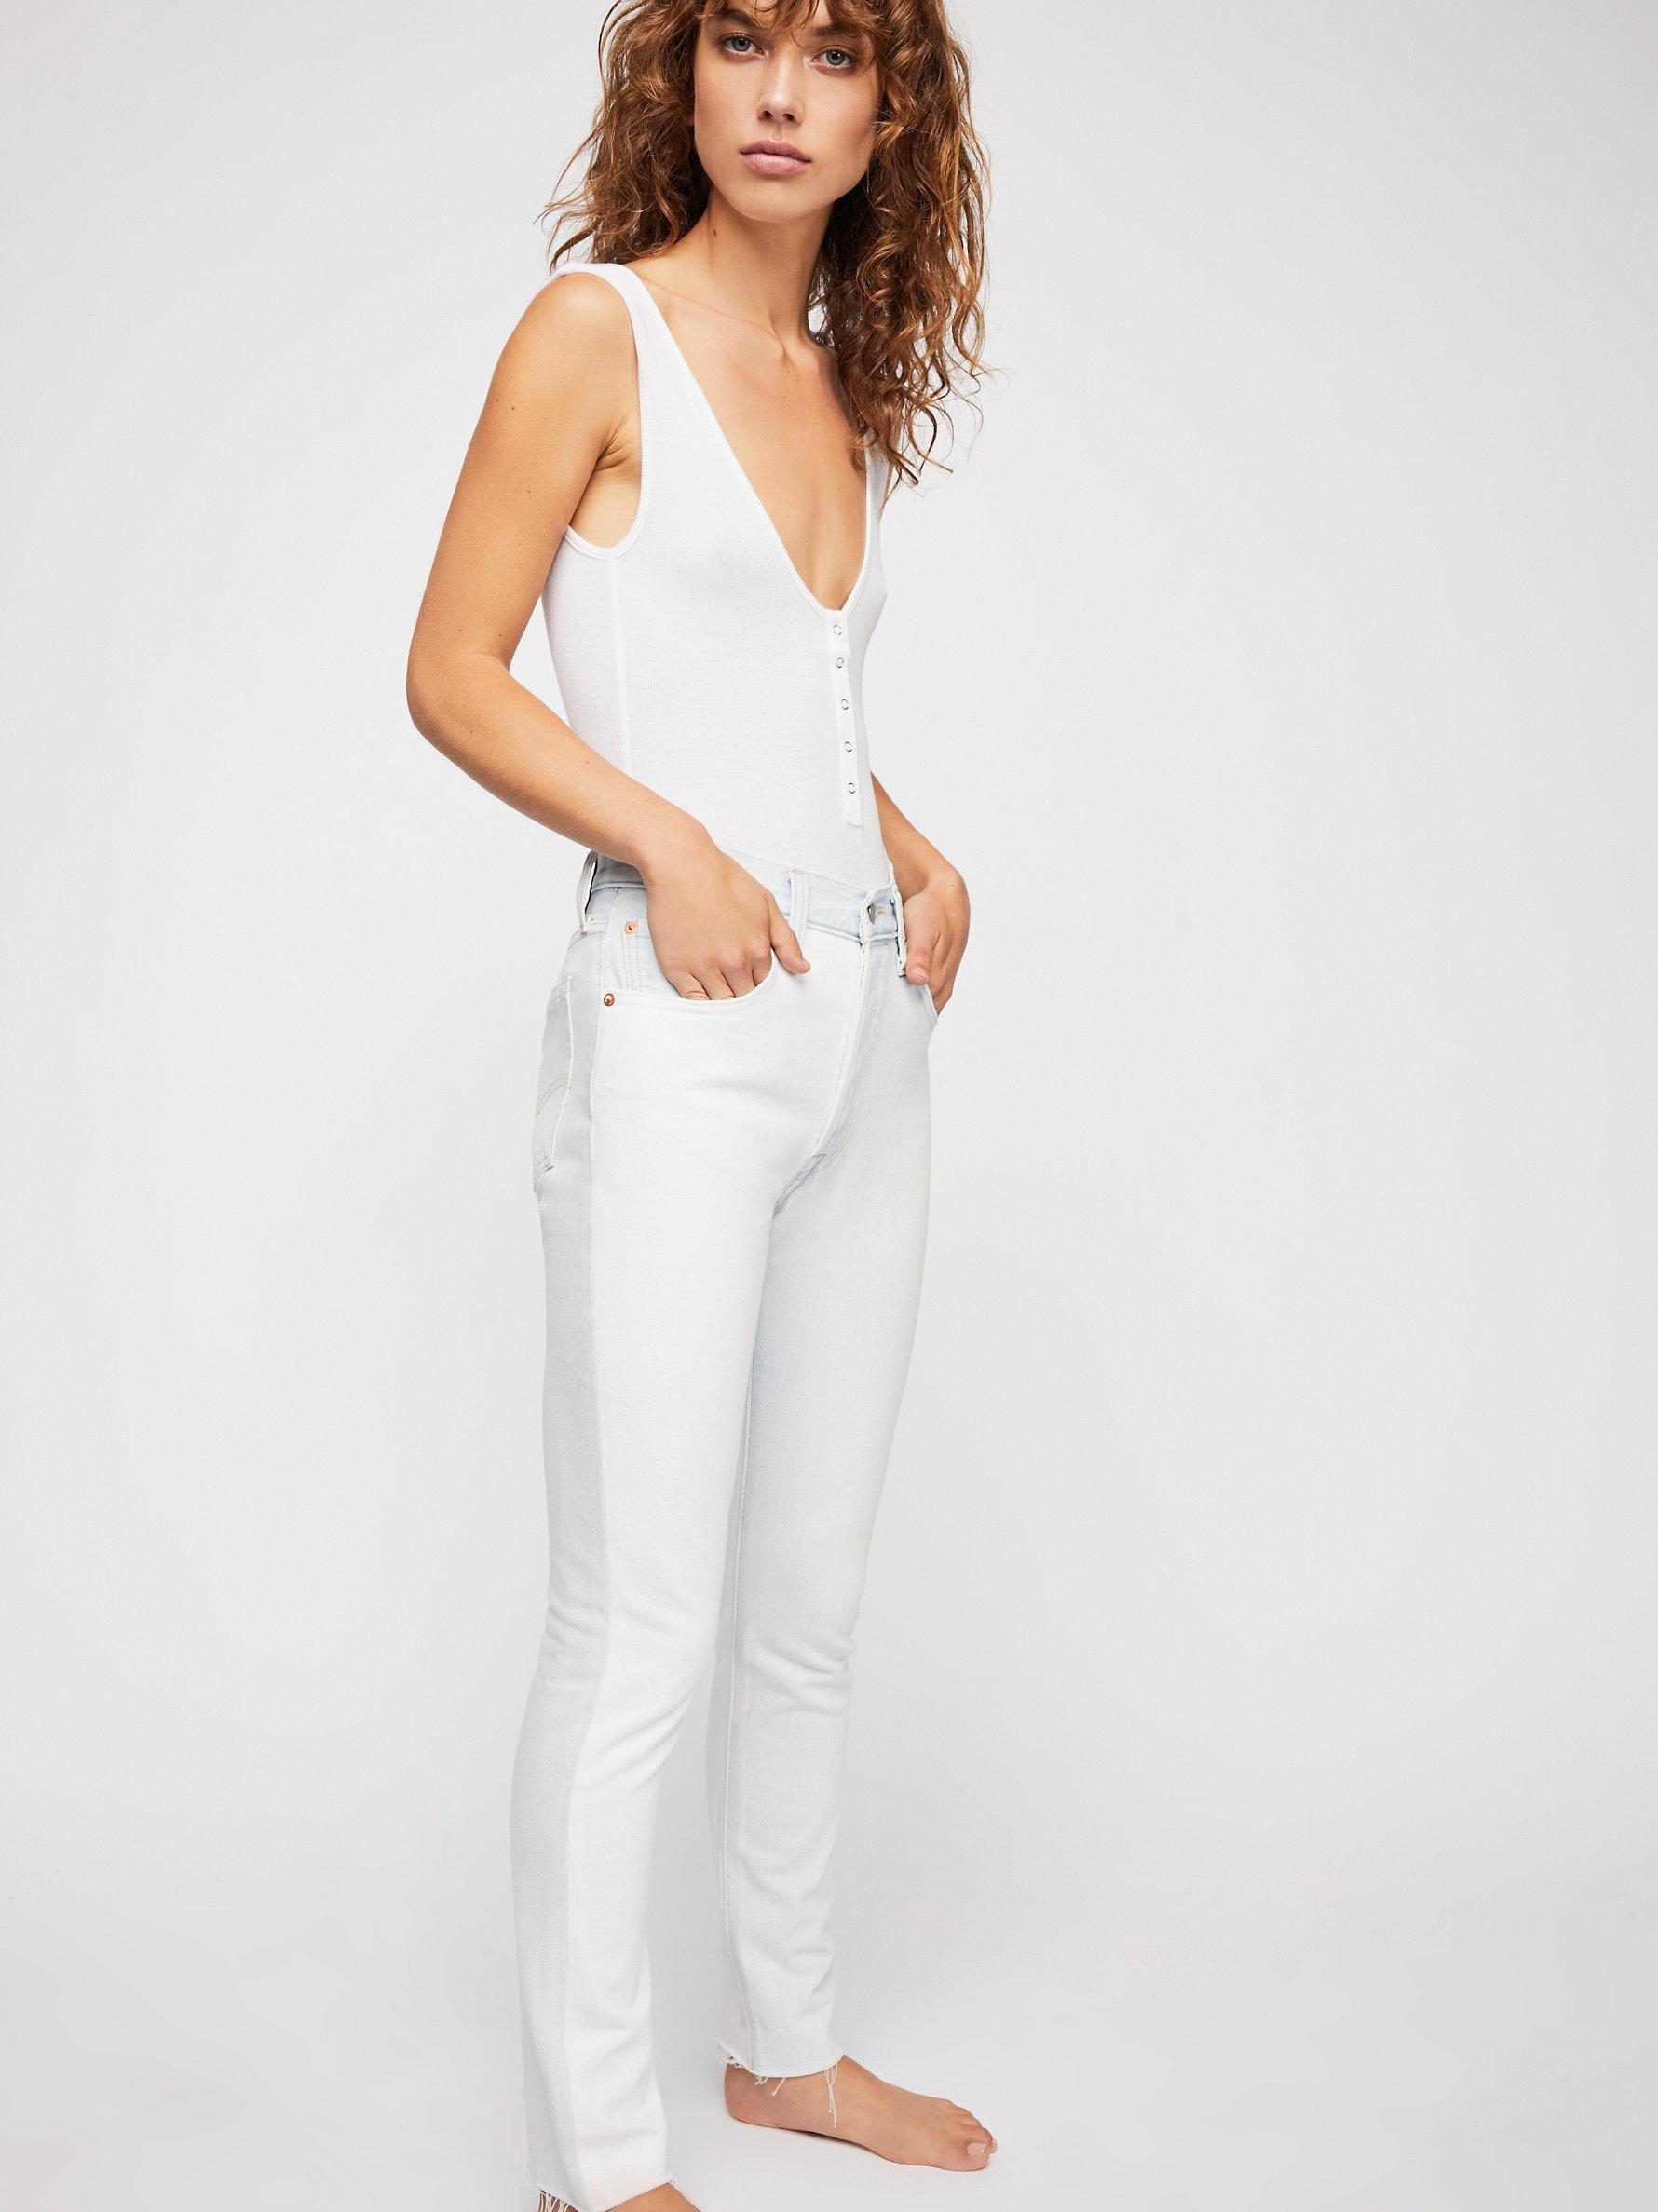 Free People Denim 501 Skinny Jeans in White